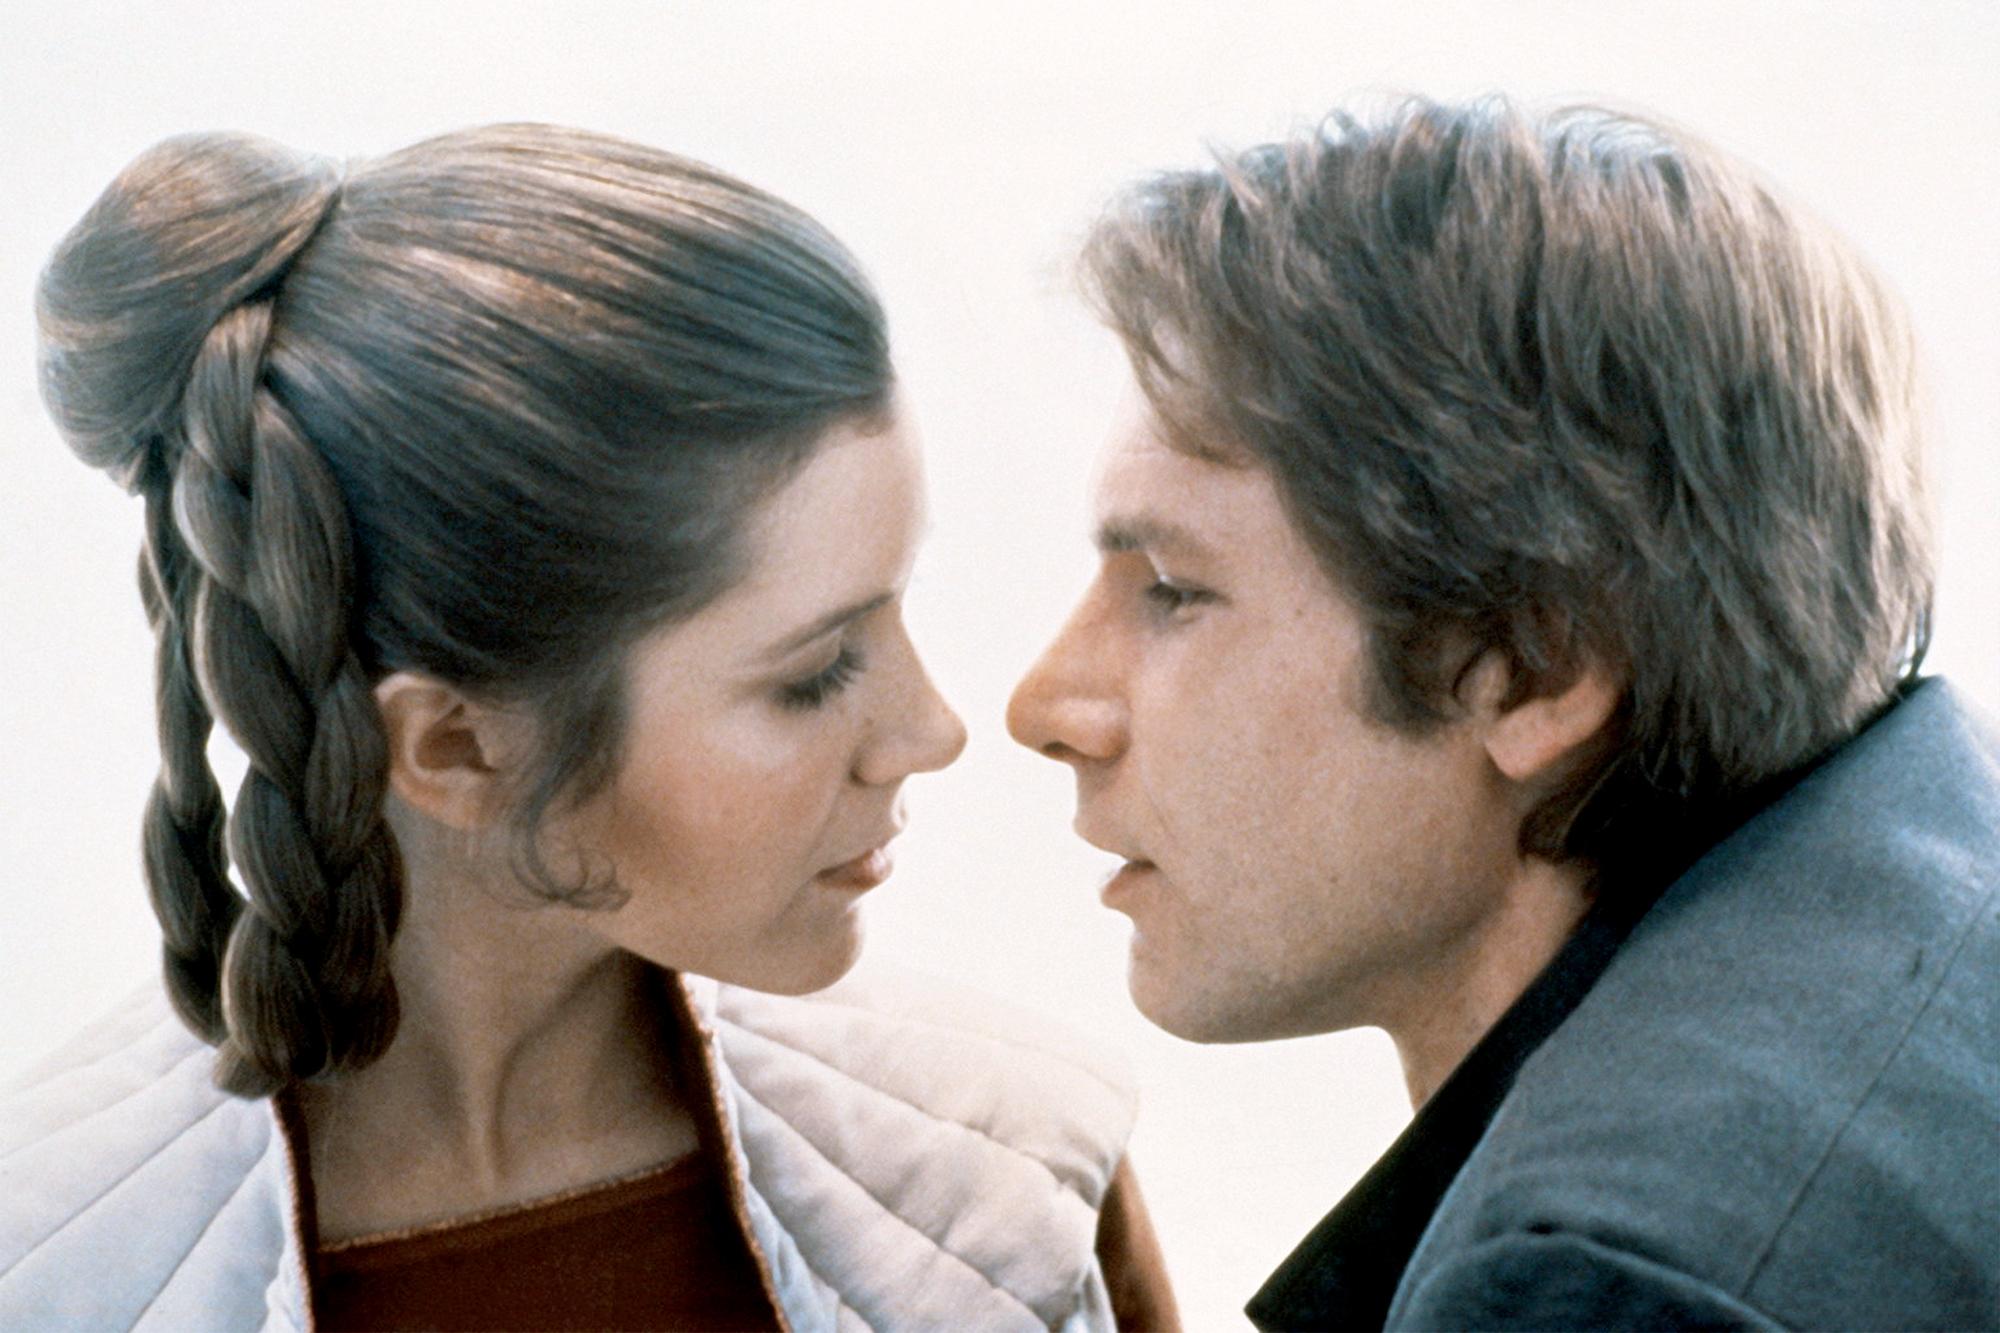 Han Solo and Princess Leia